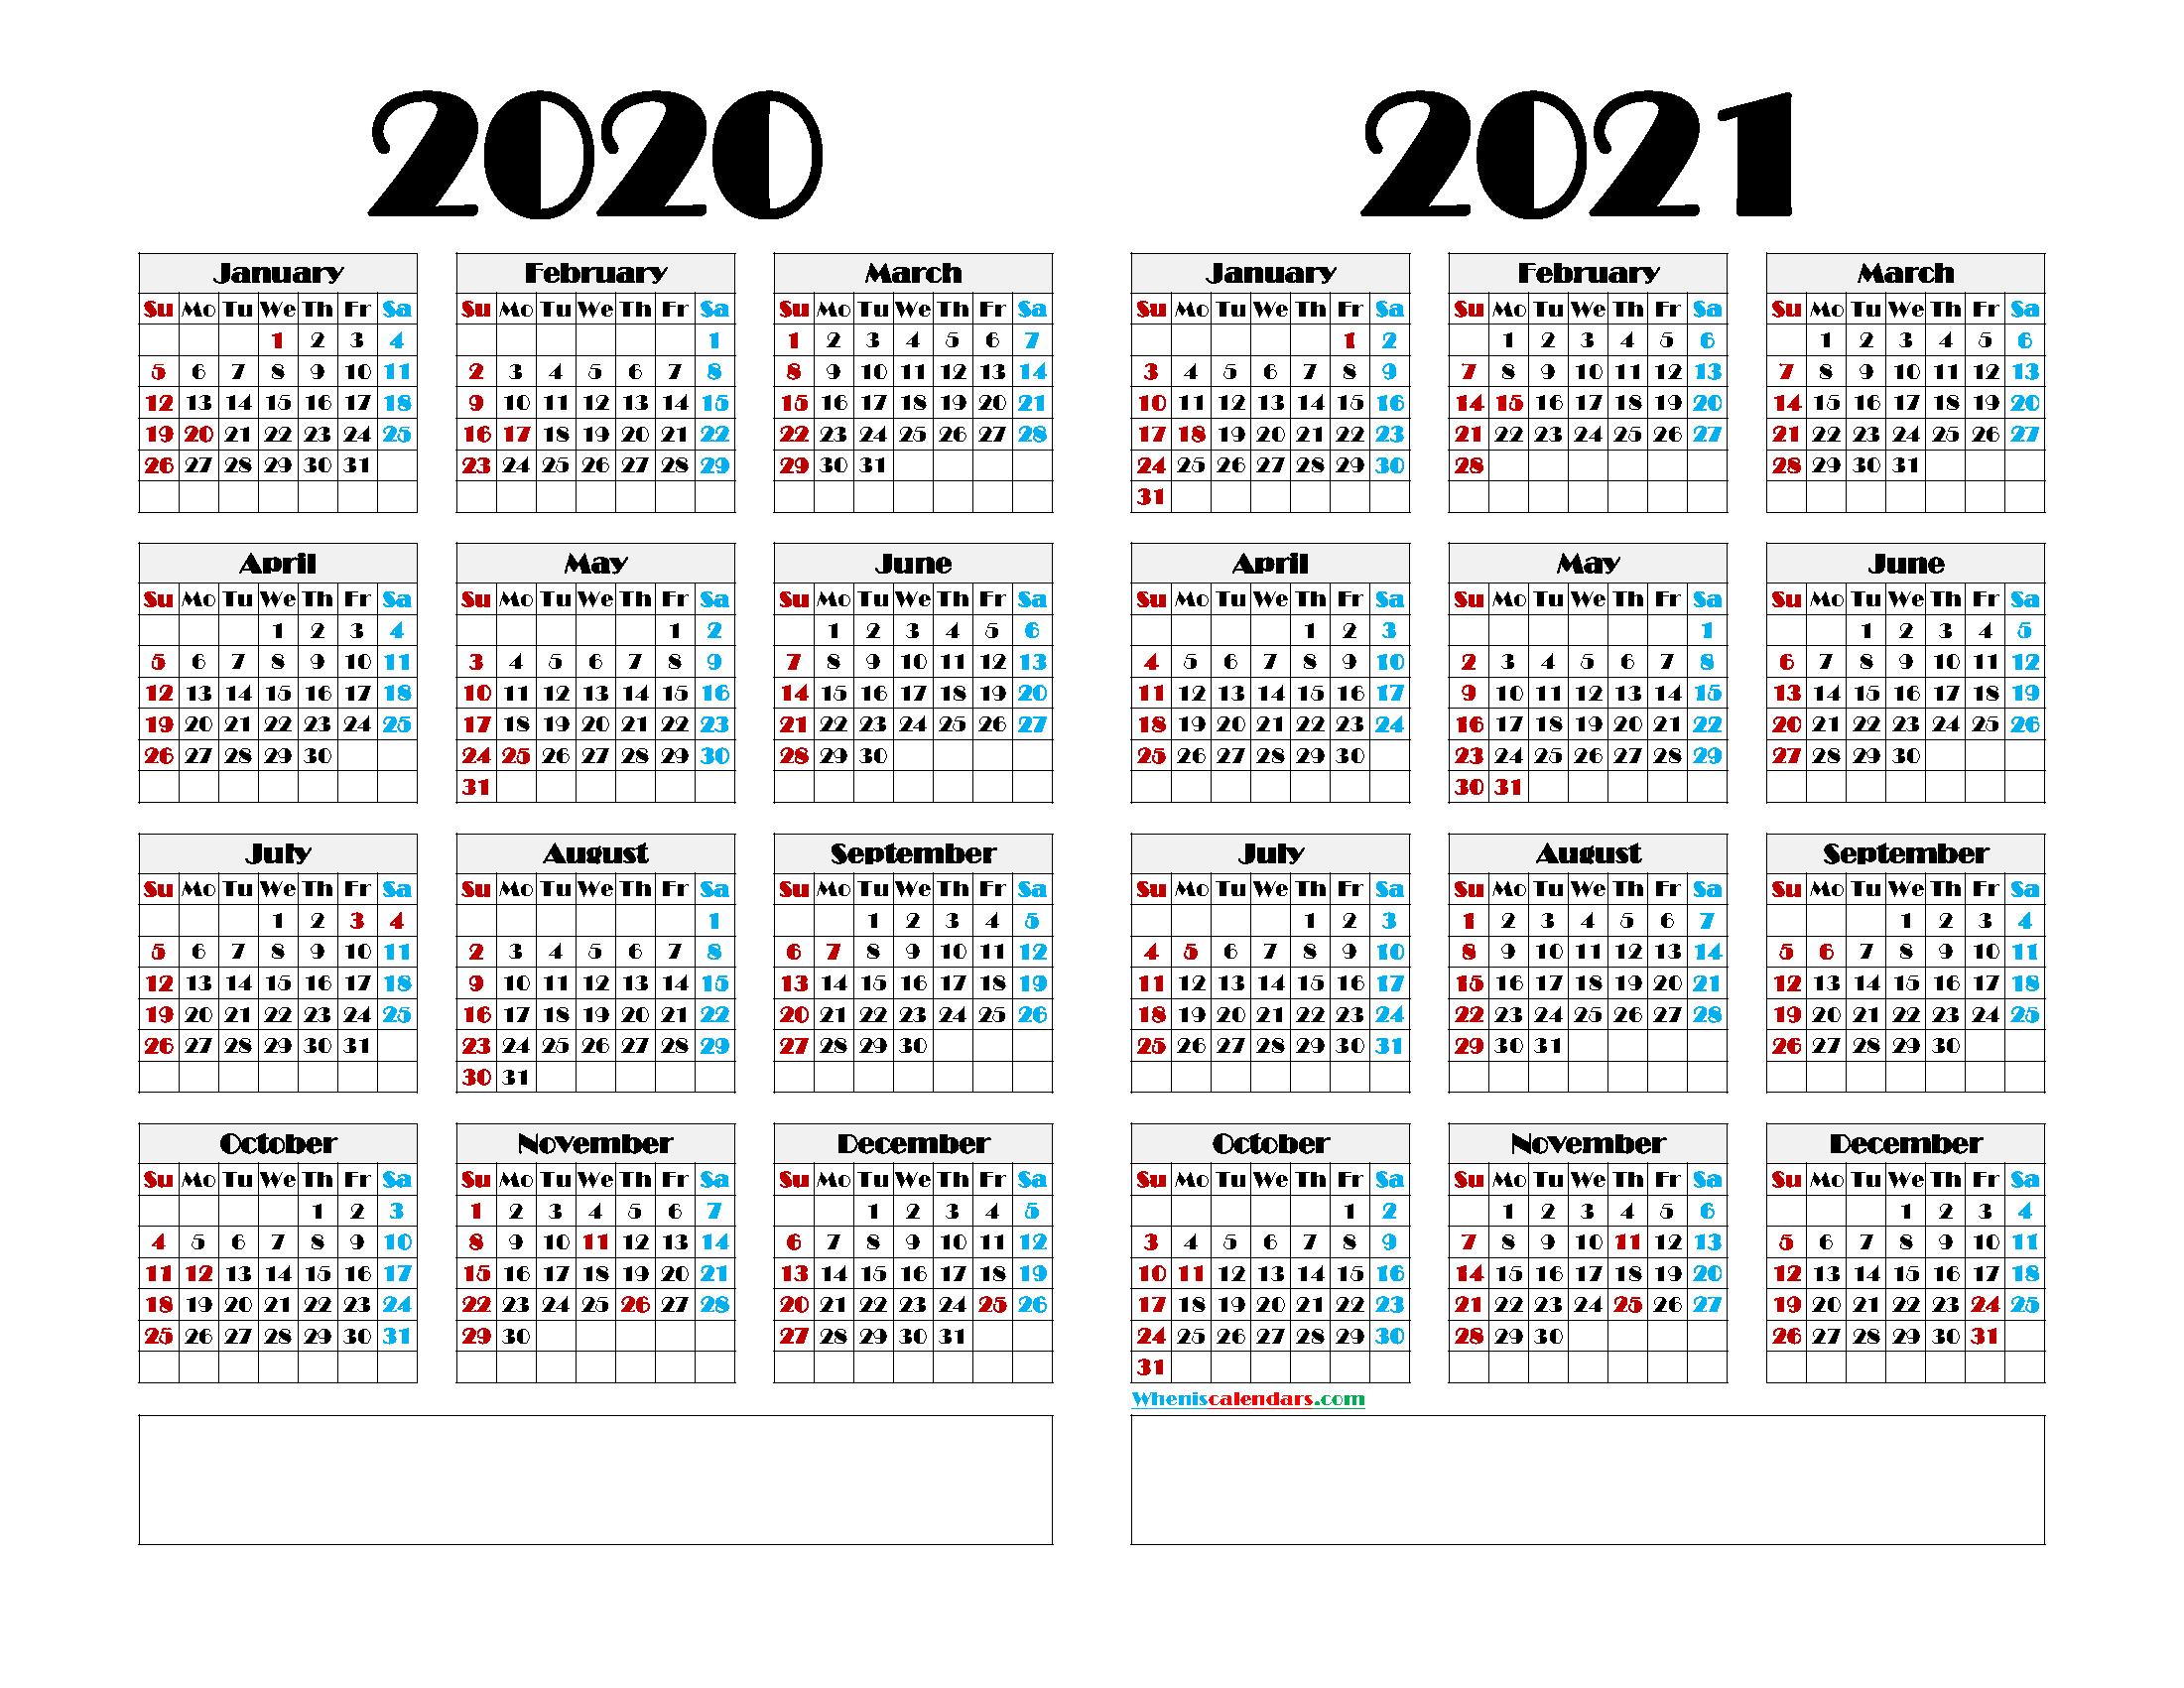 2020 and 2021 Calendar Printable Lanscape